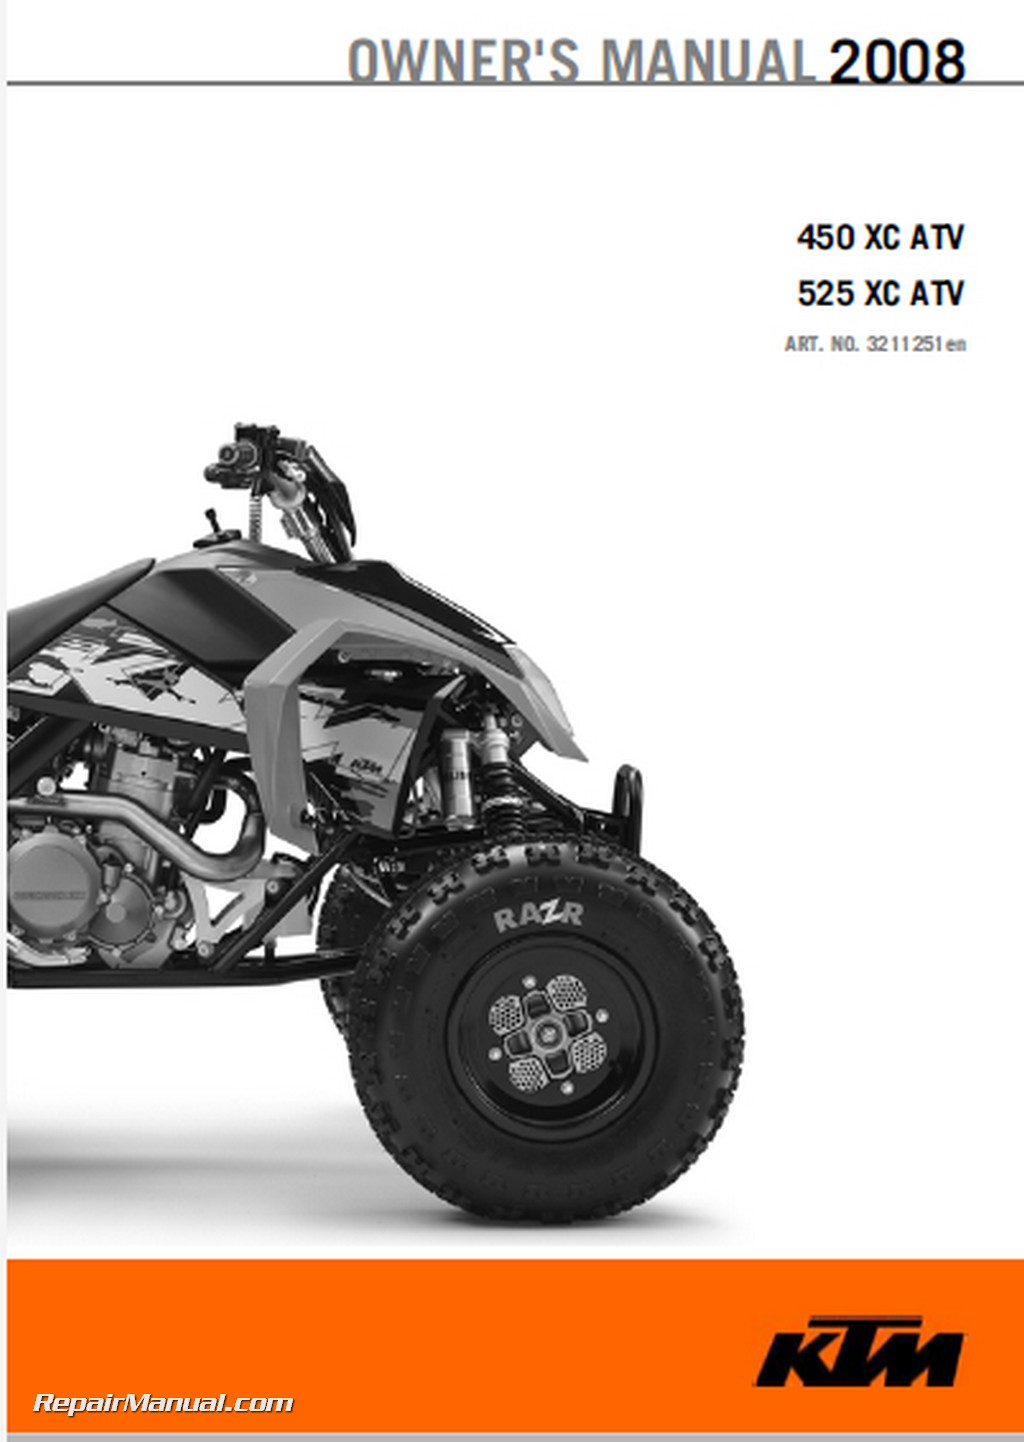 Ktm  Xc Atv Owners Manual